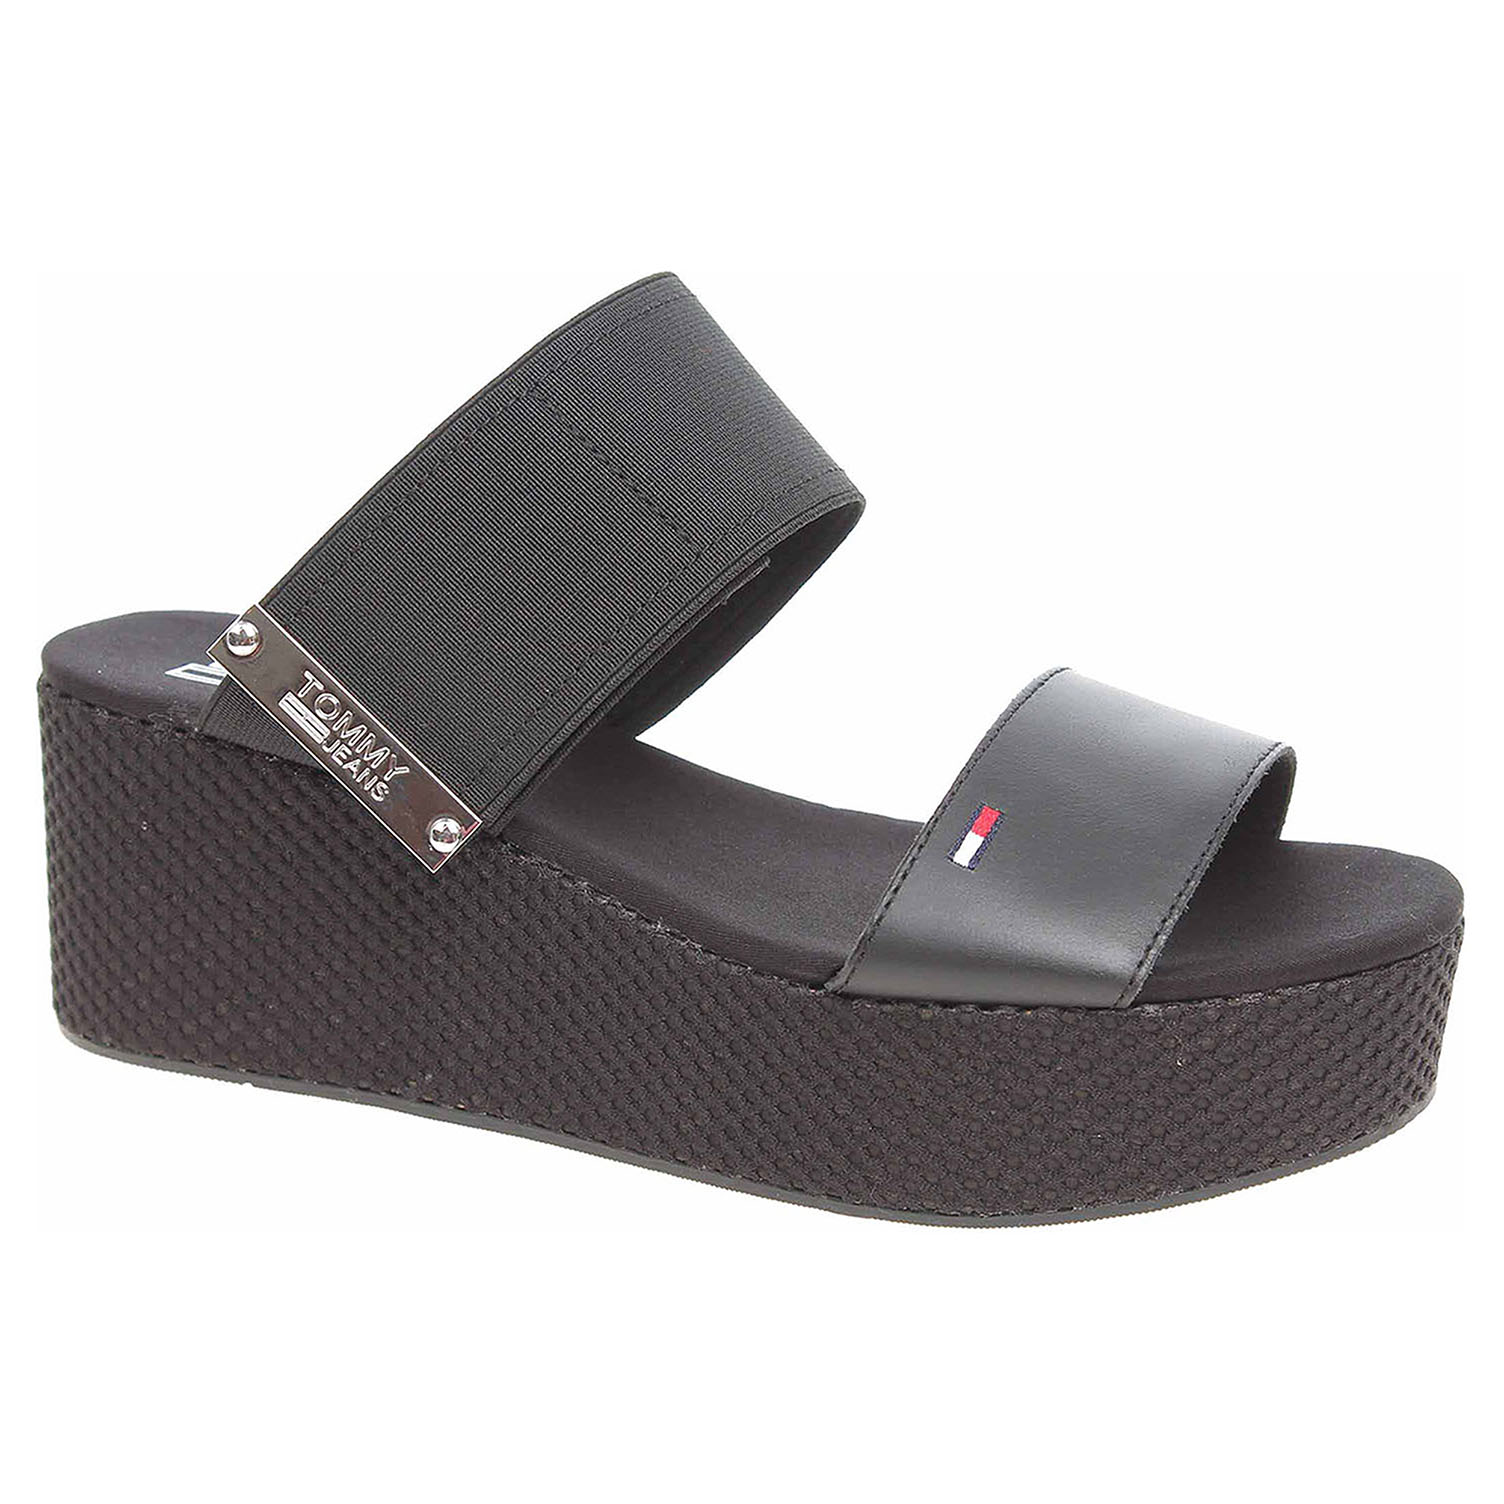 bbda03b79 Dámské pantofle Tommy Hilfiger EN0EN00217 990 black | Rejnok obuv